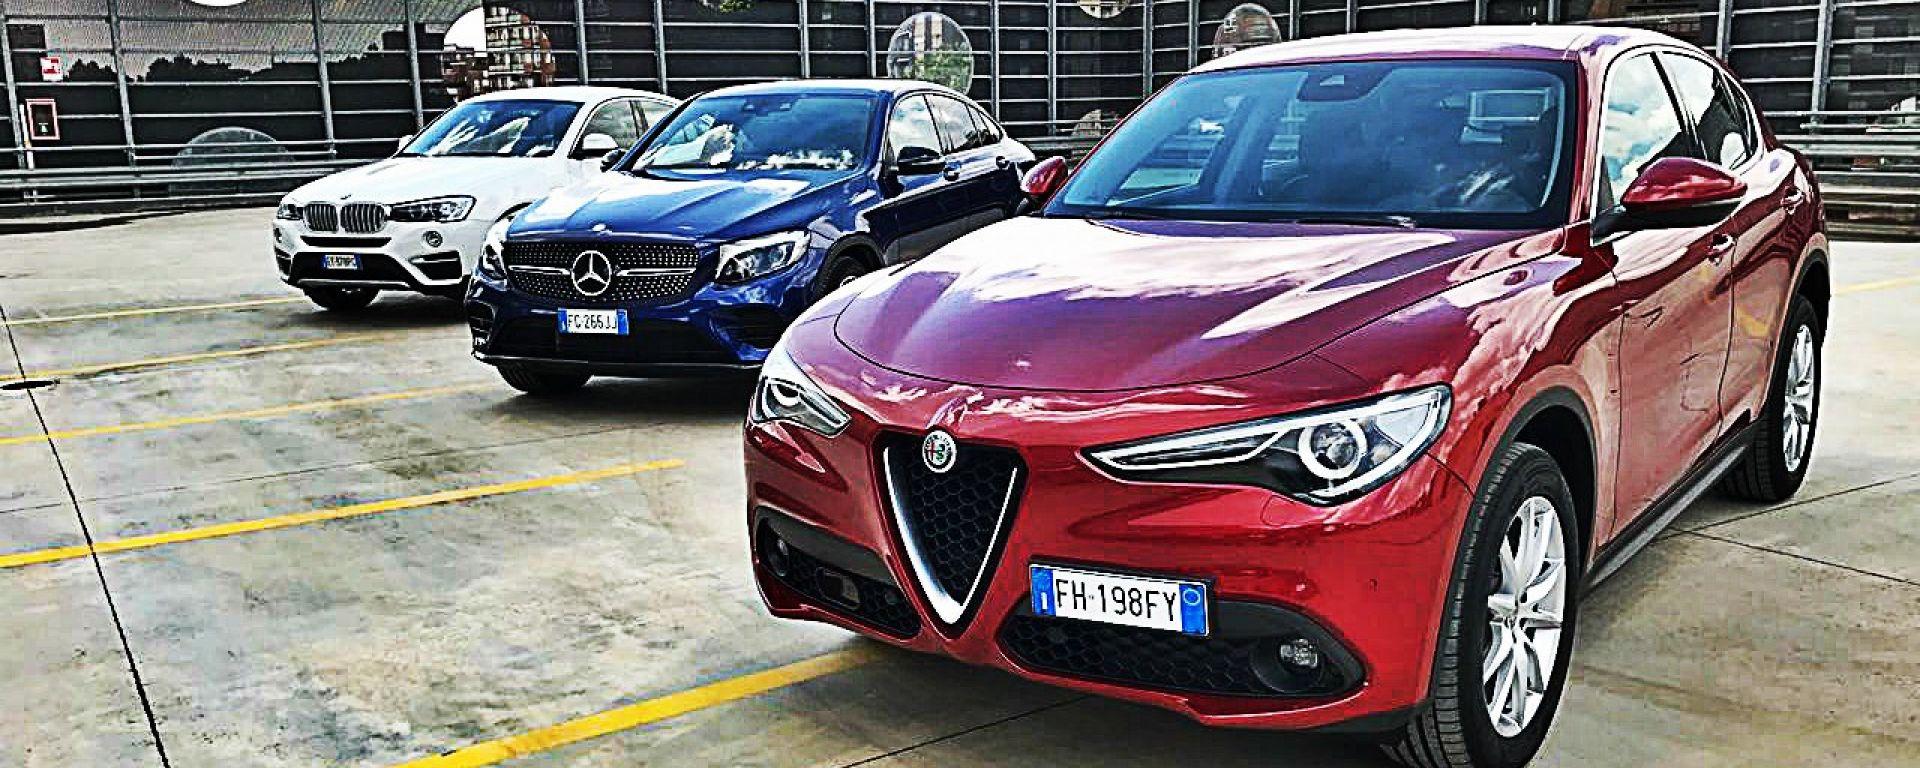 Alfa Romeo Stelvio vs Mercedes GLC Coupé vs BMW X4